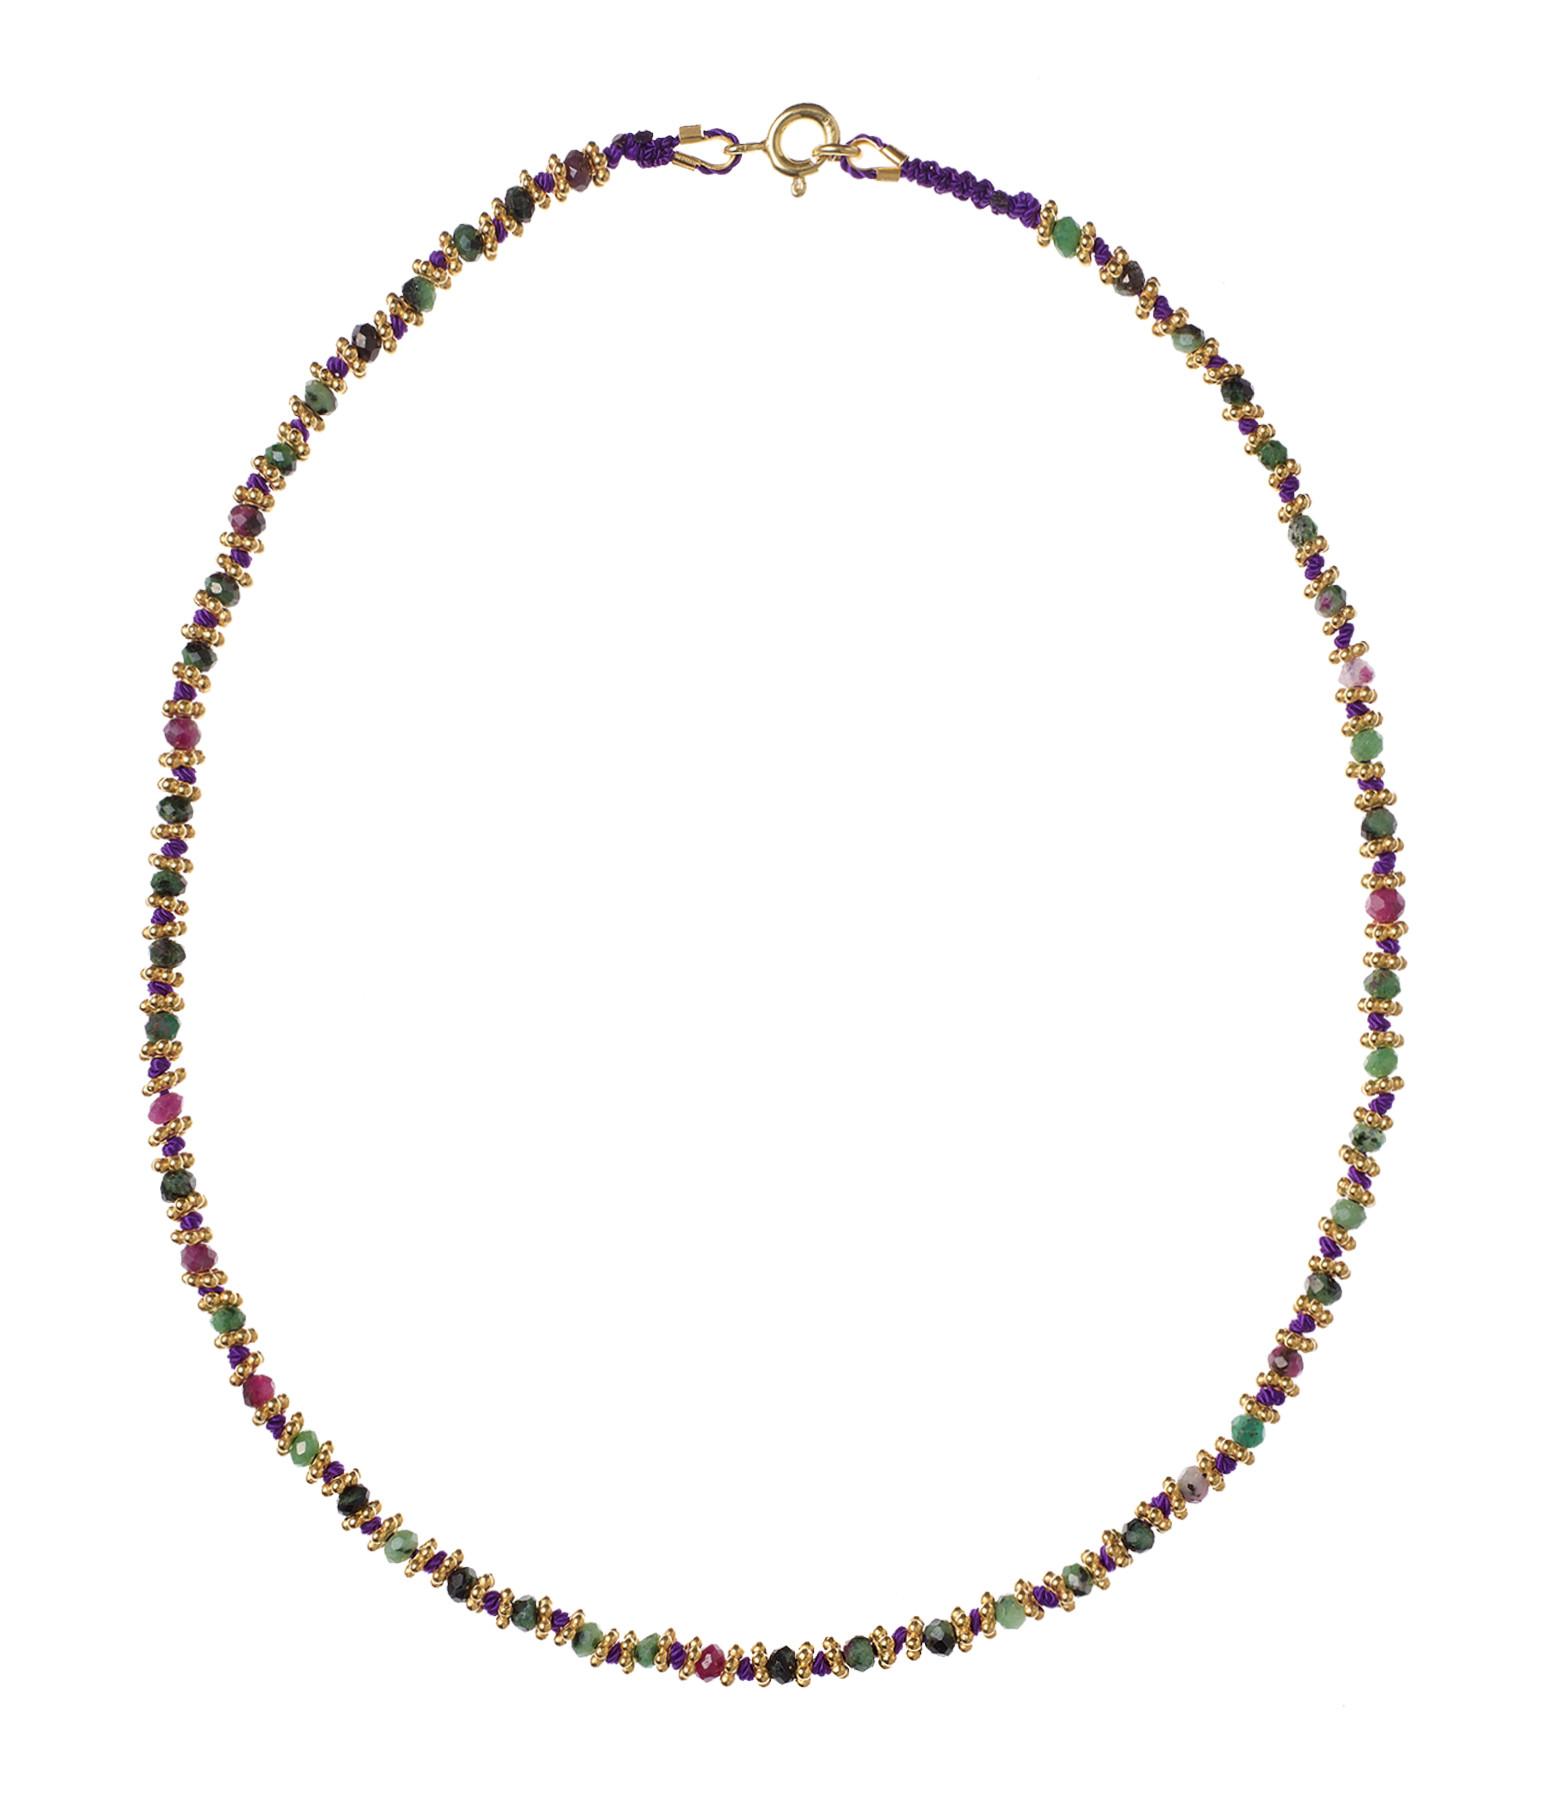 TITYARAVY - Collier Kamala Violet Rubisoizite Plaqué Or